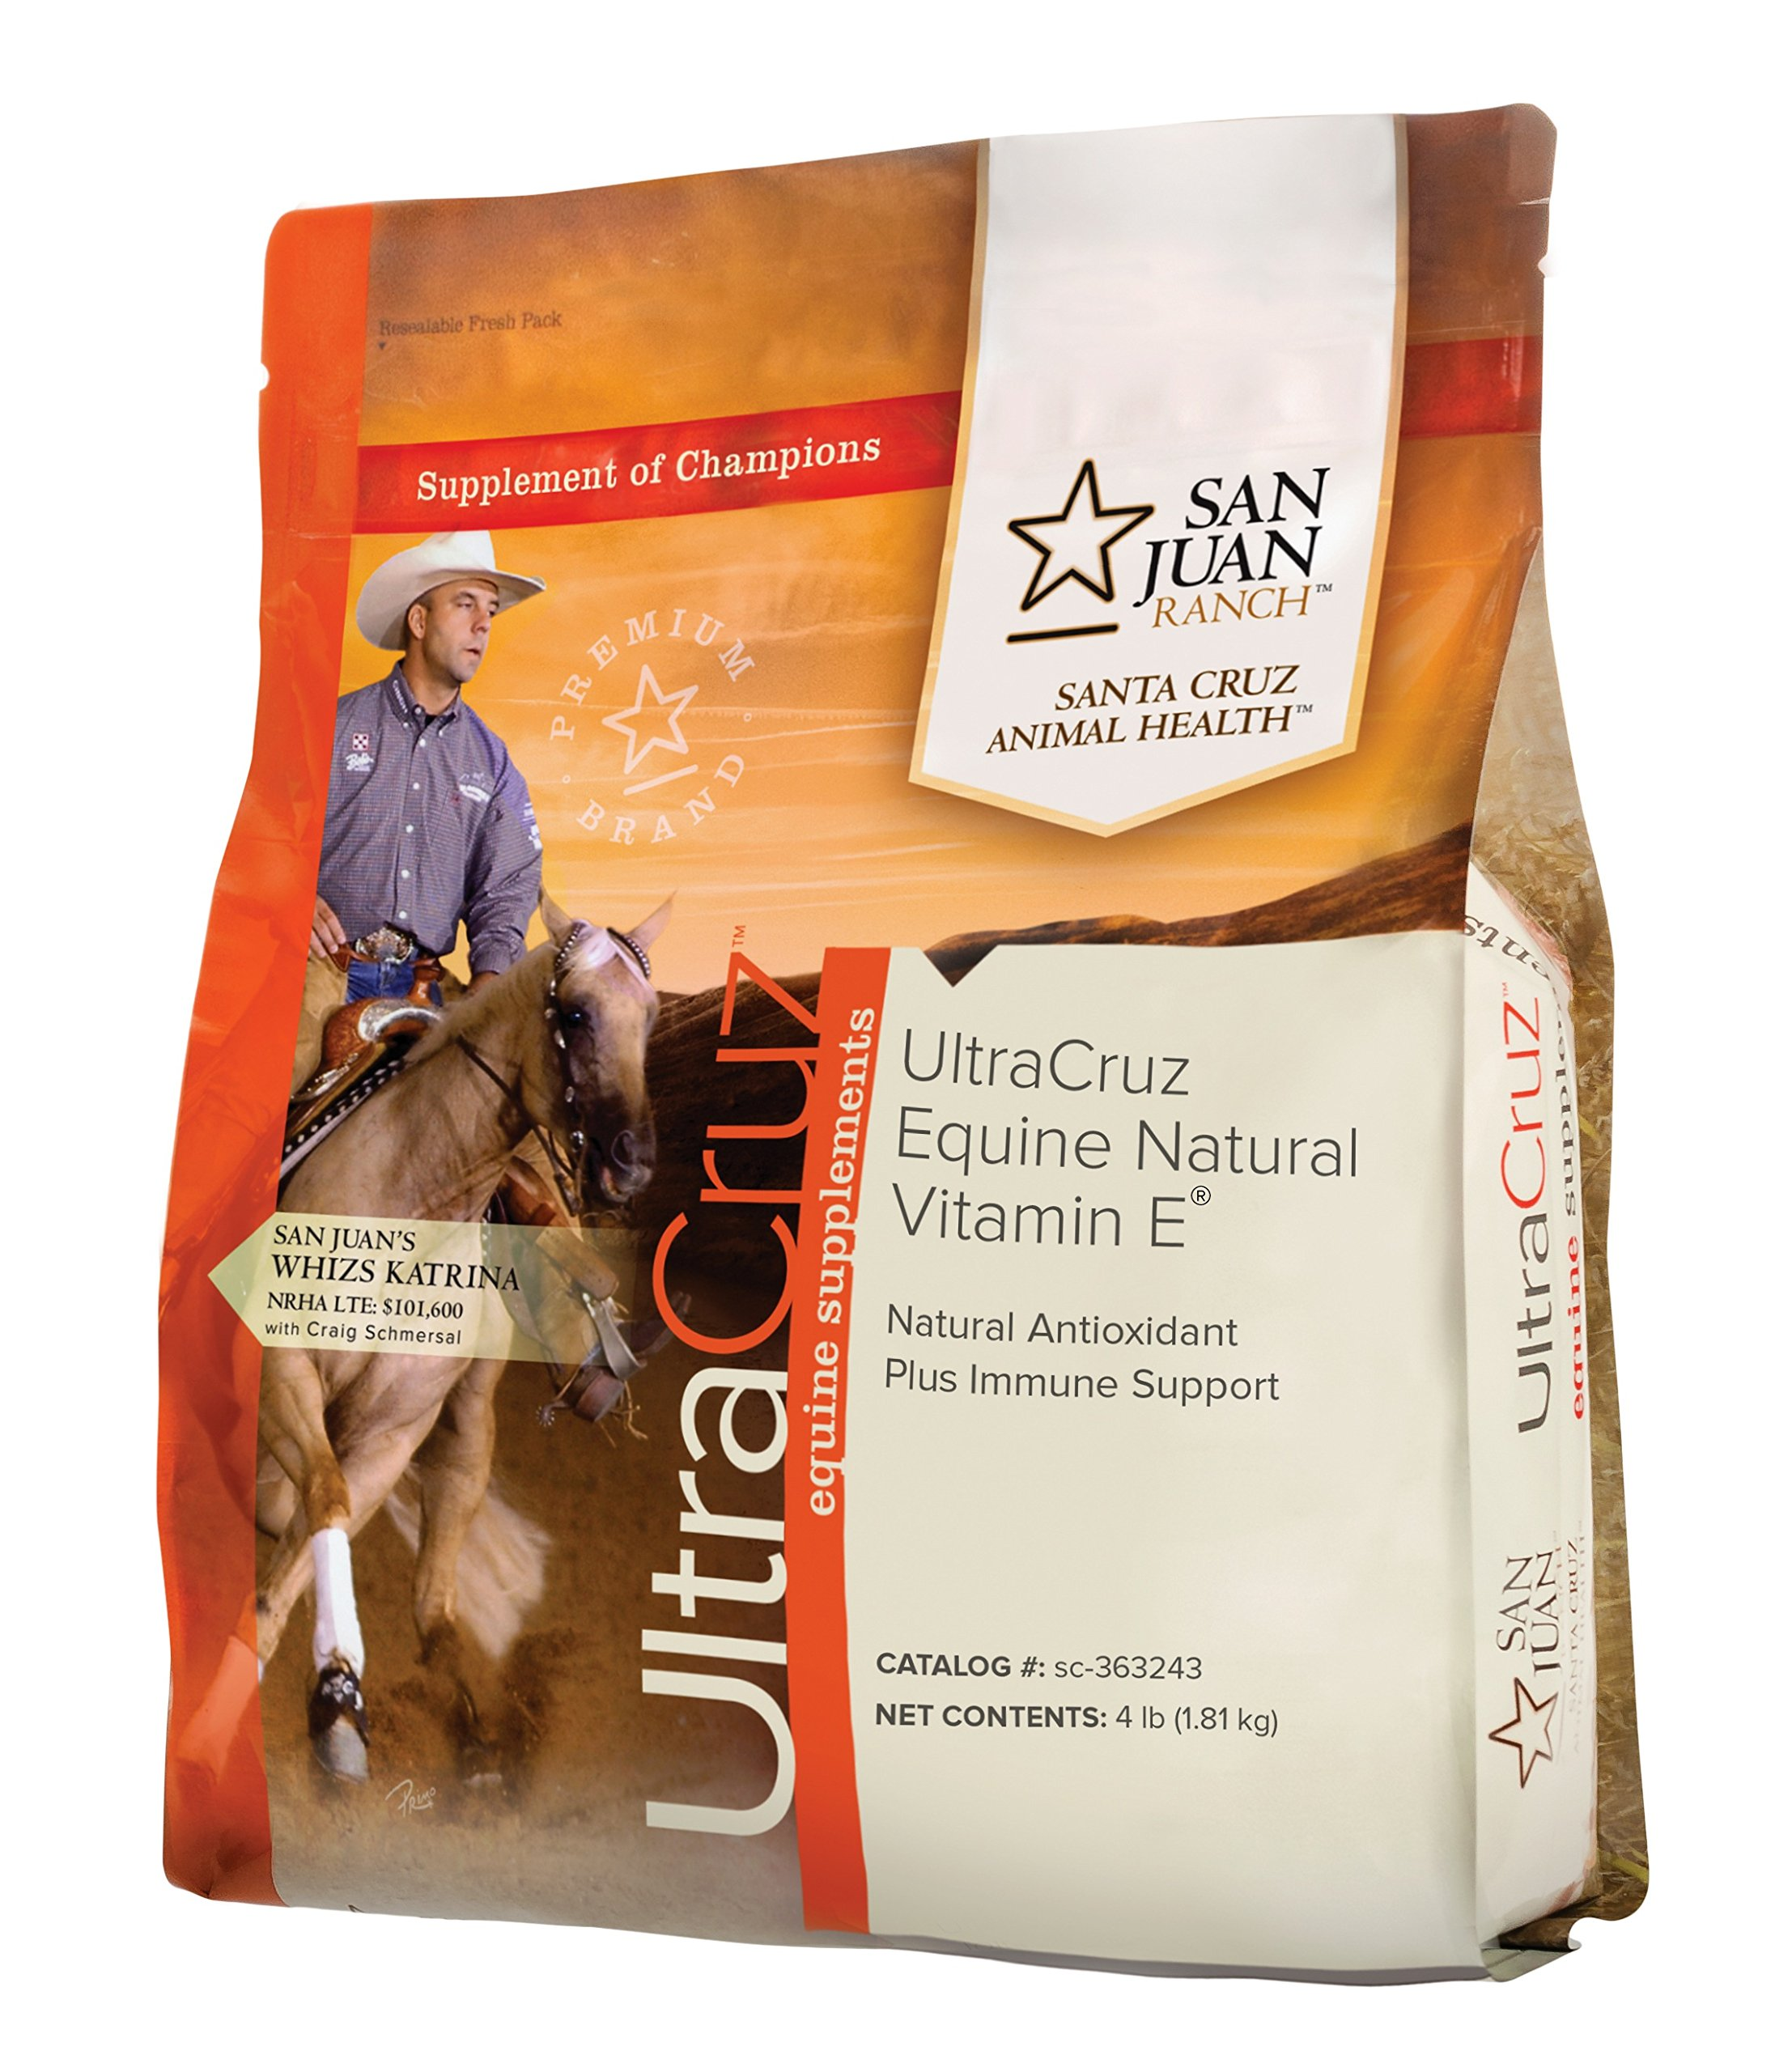 UltraCruz Equine Natural Vitamin E Supplement for Horses, 4 pounds by UltraCruz (Image #1)